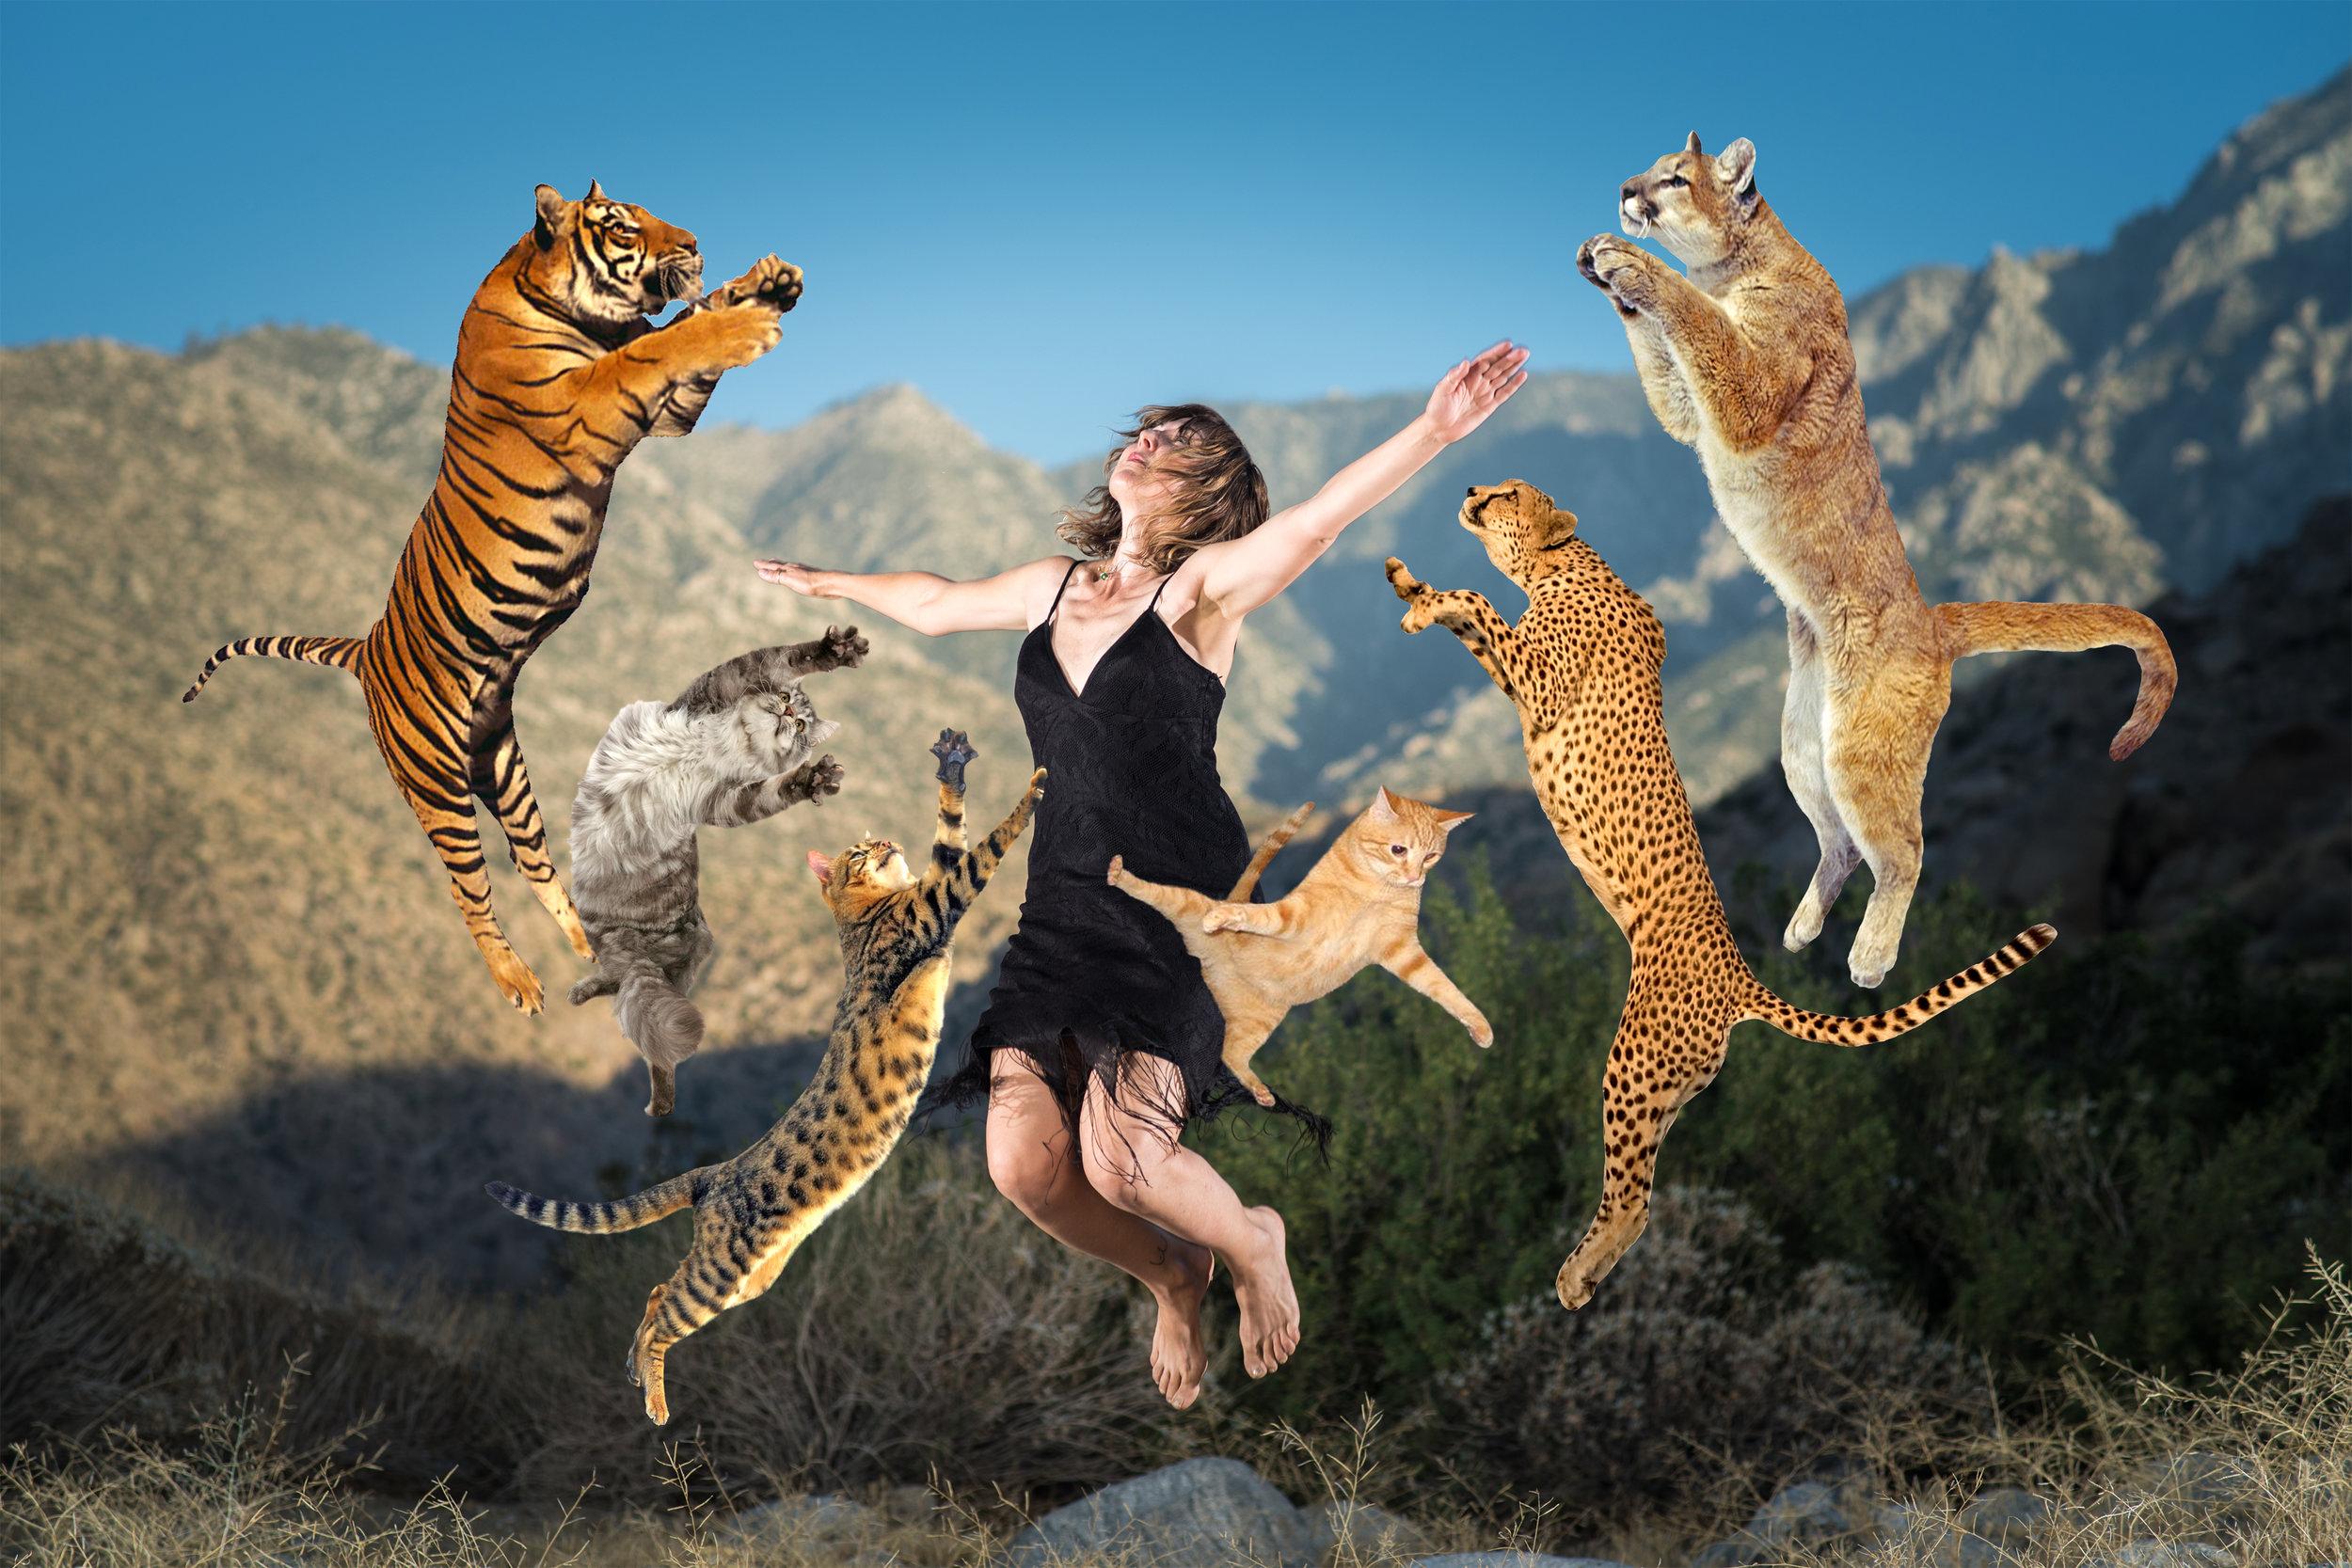 Bettina jumping with cats_B.jpg